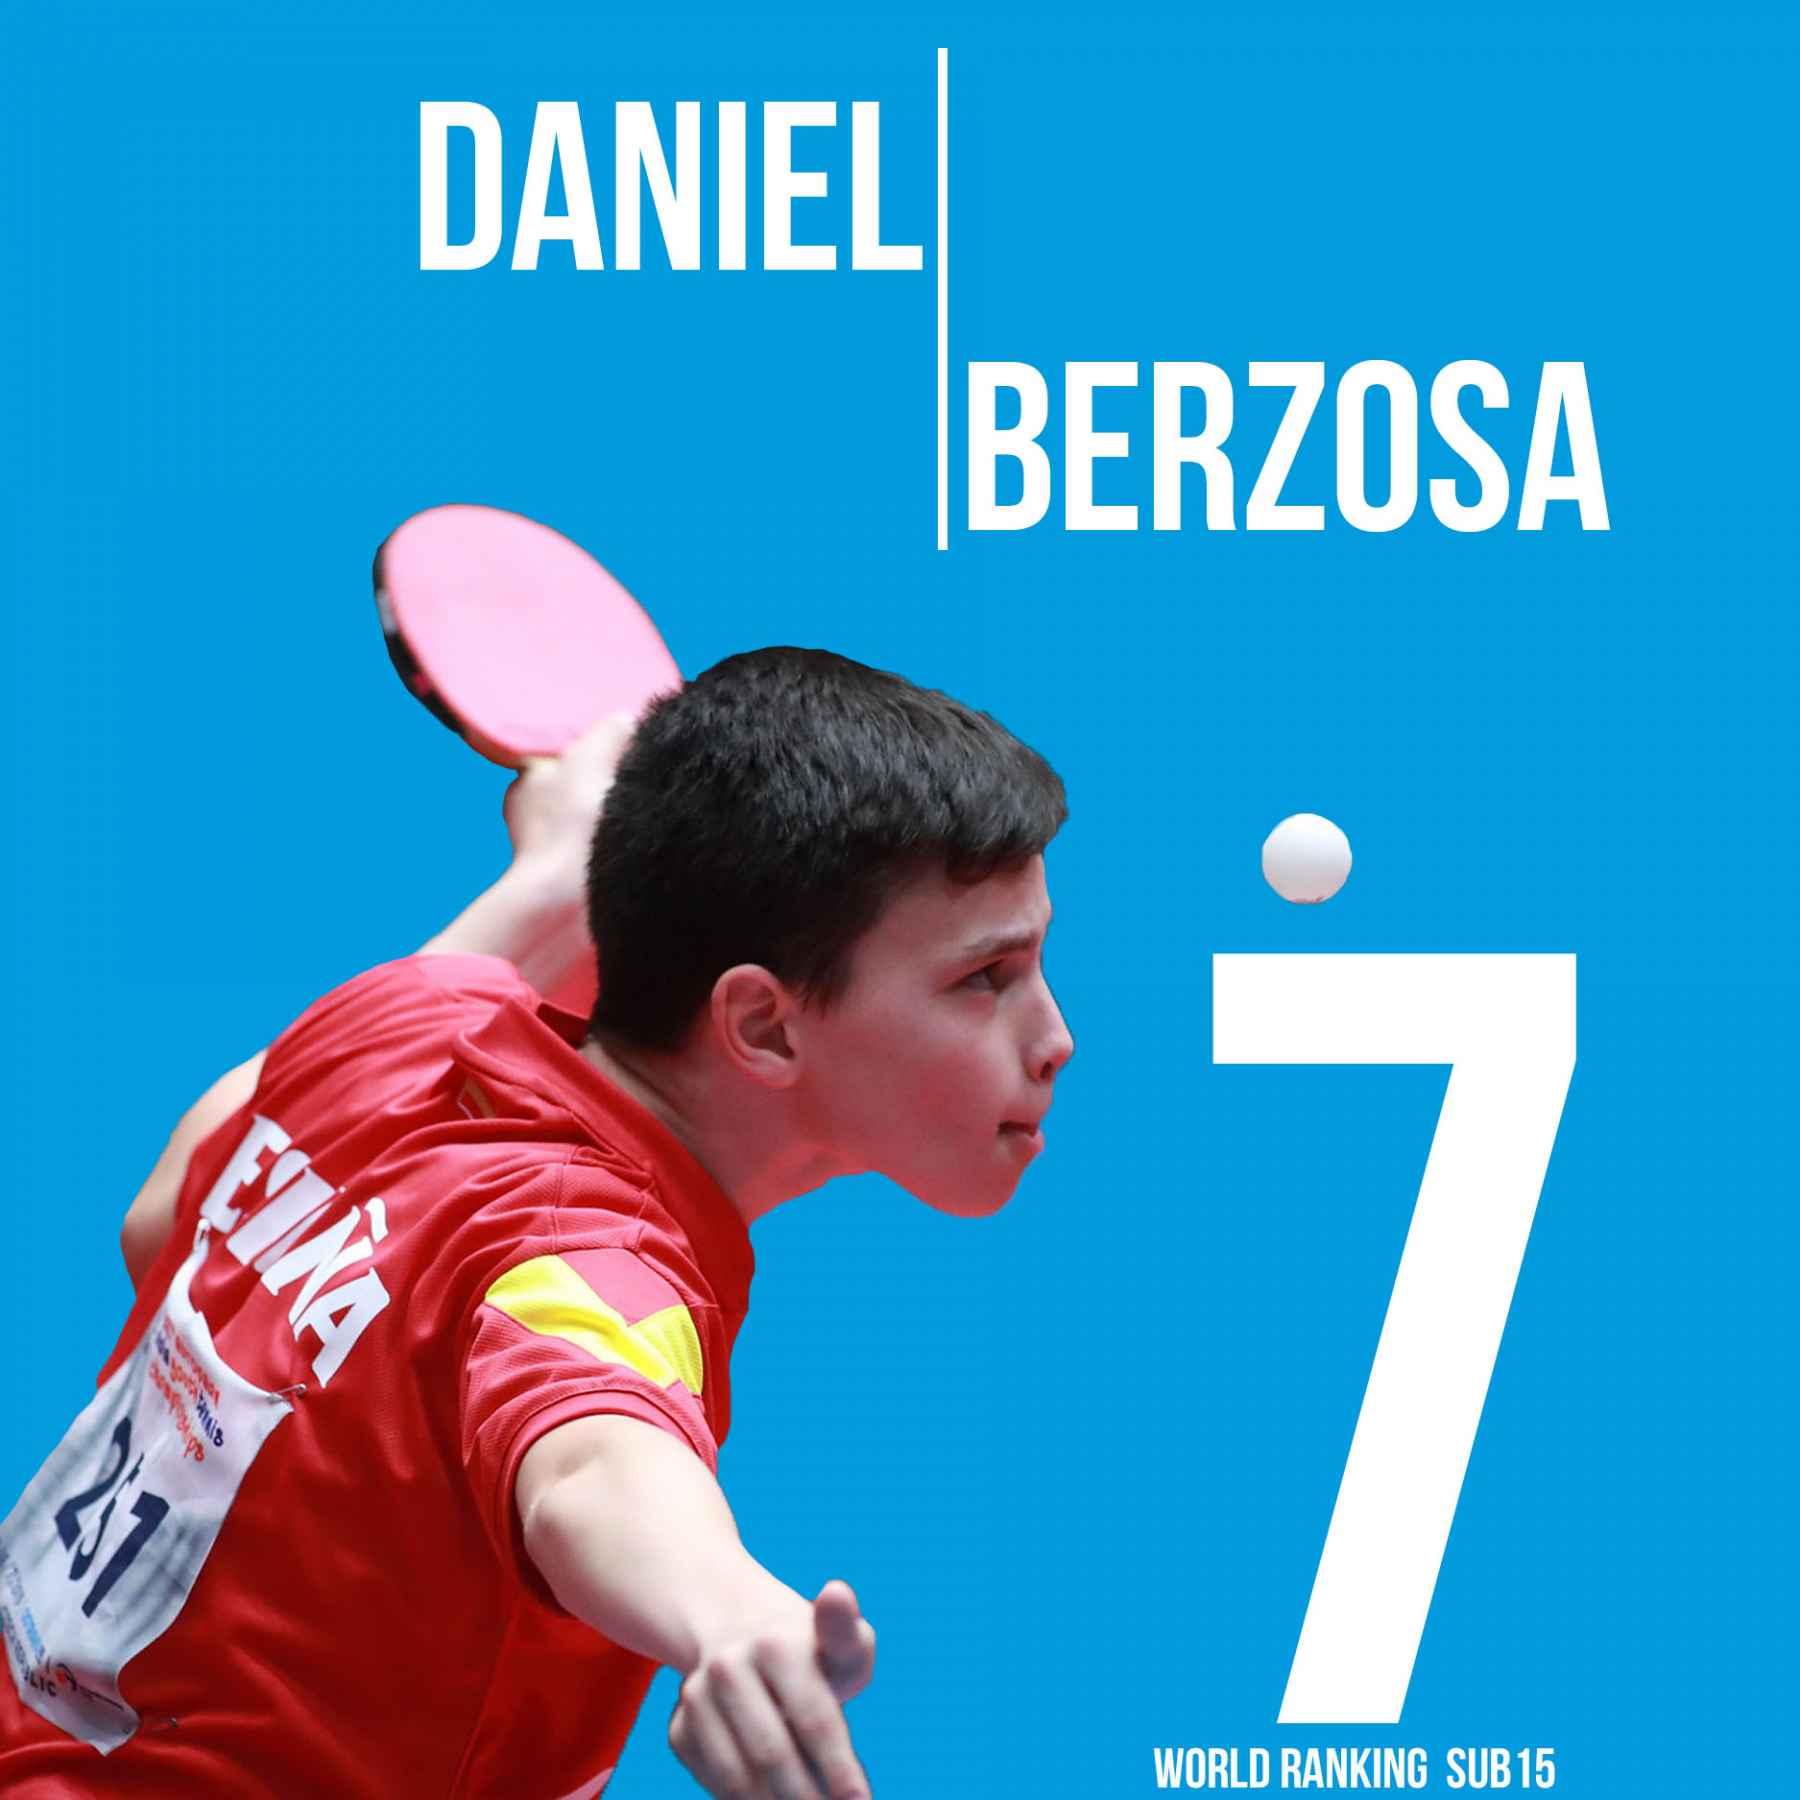 Daniel Berzosa, 7º del mundo U15